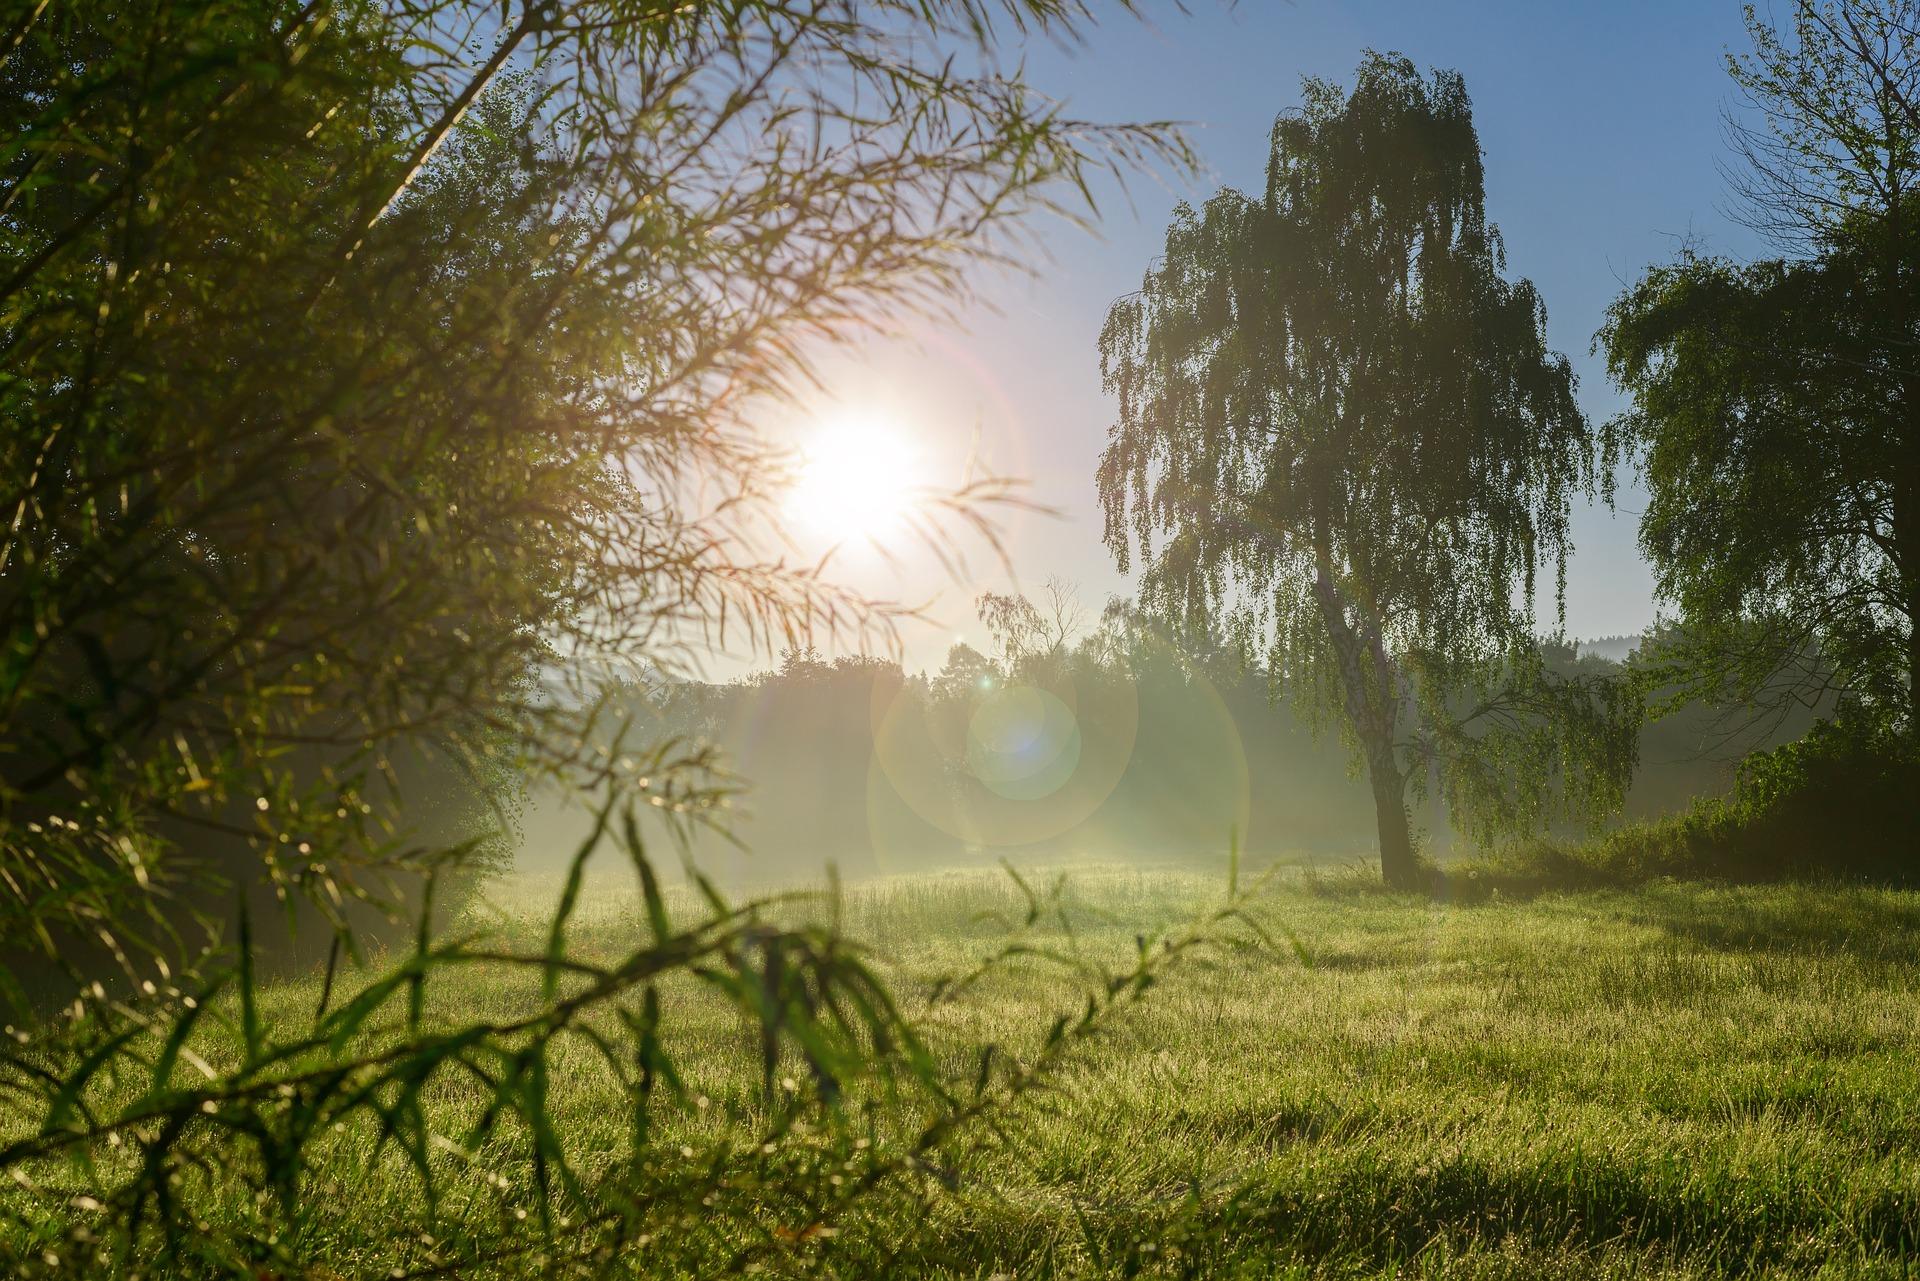 Samenhangend duurzaamheidsbeleidsplan